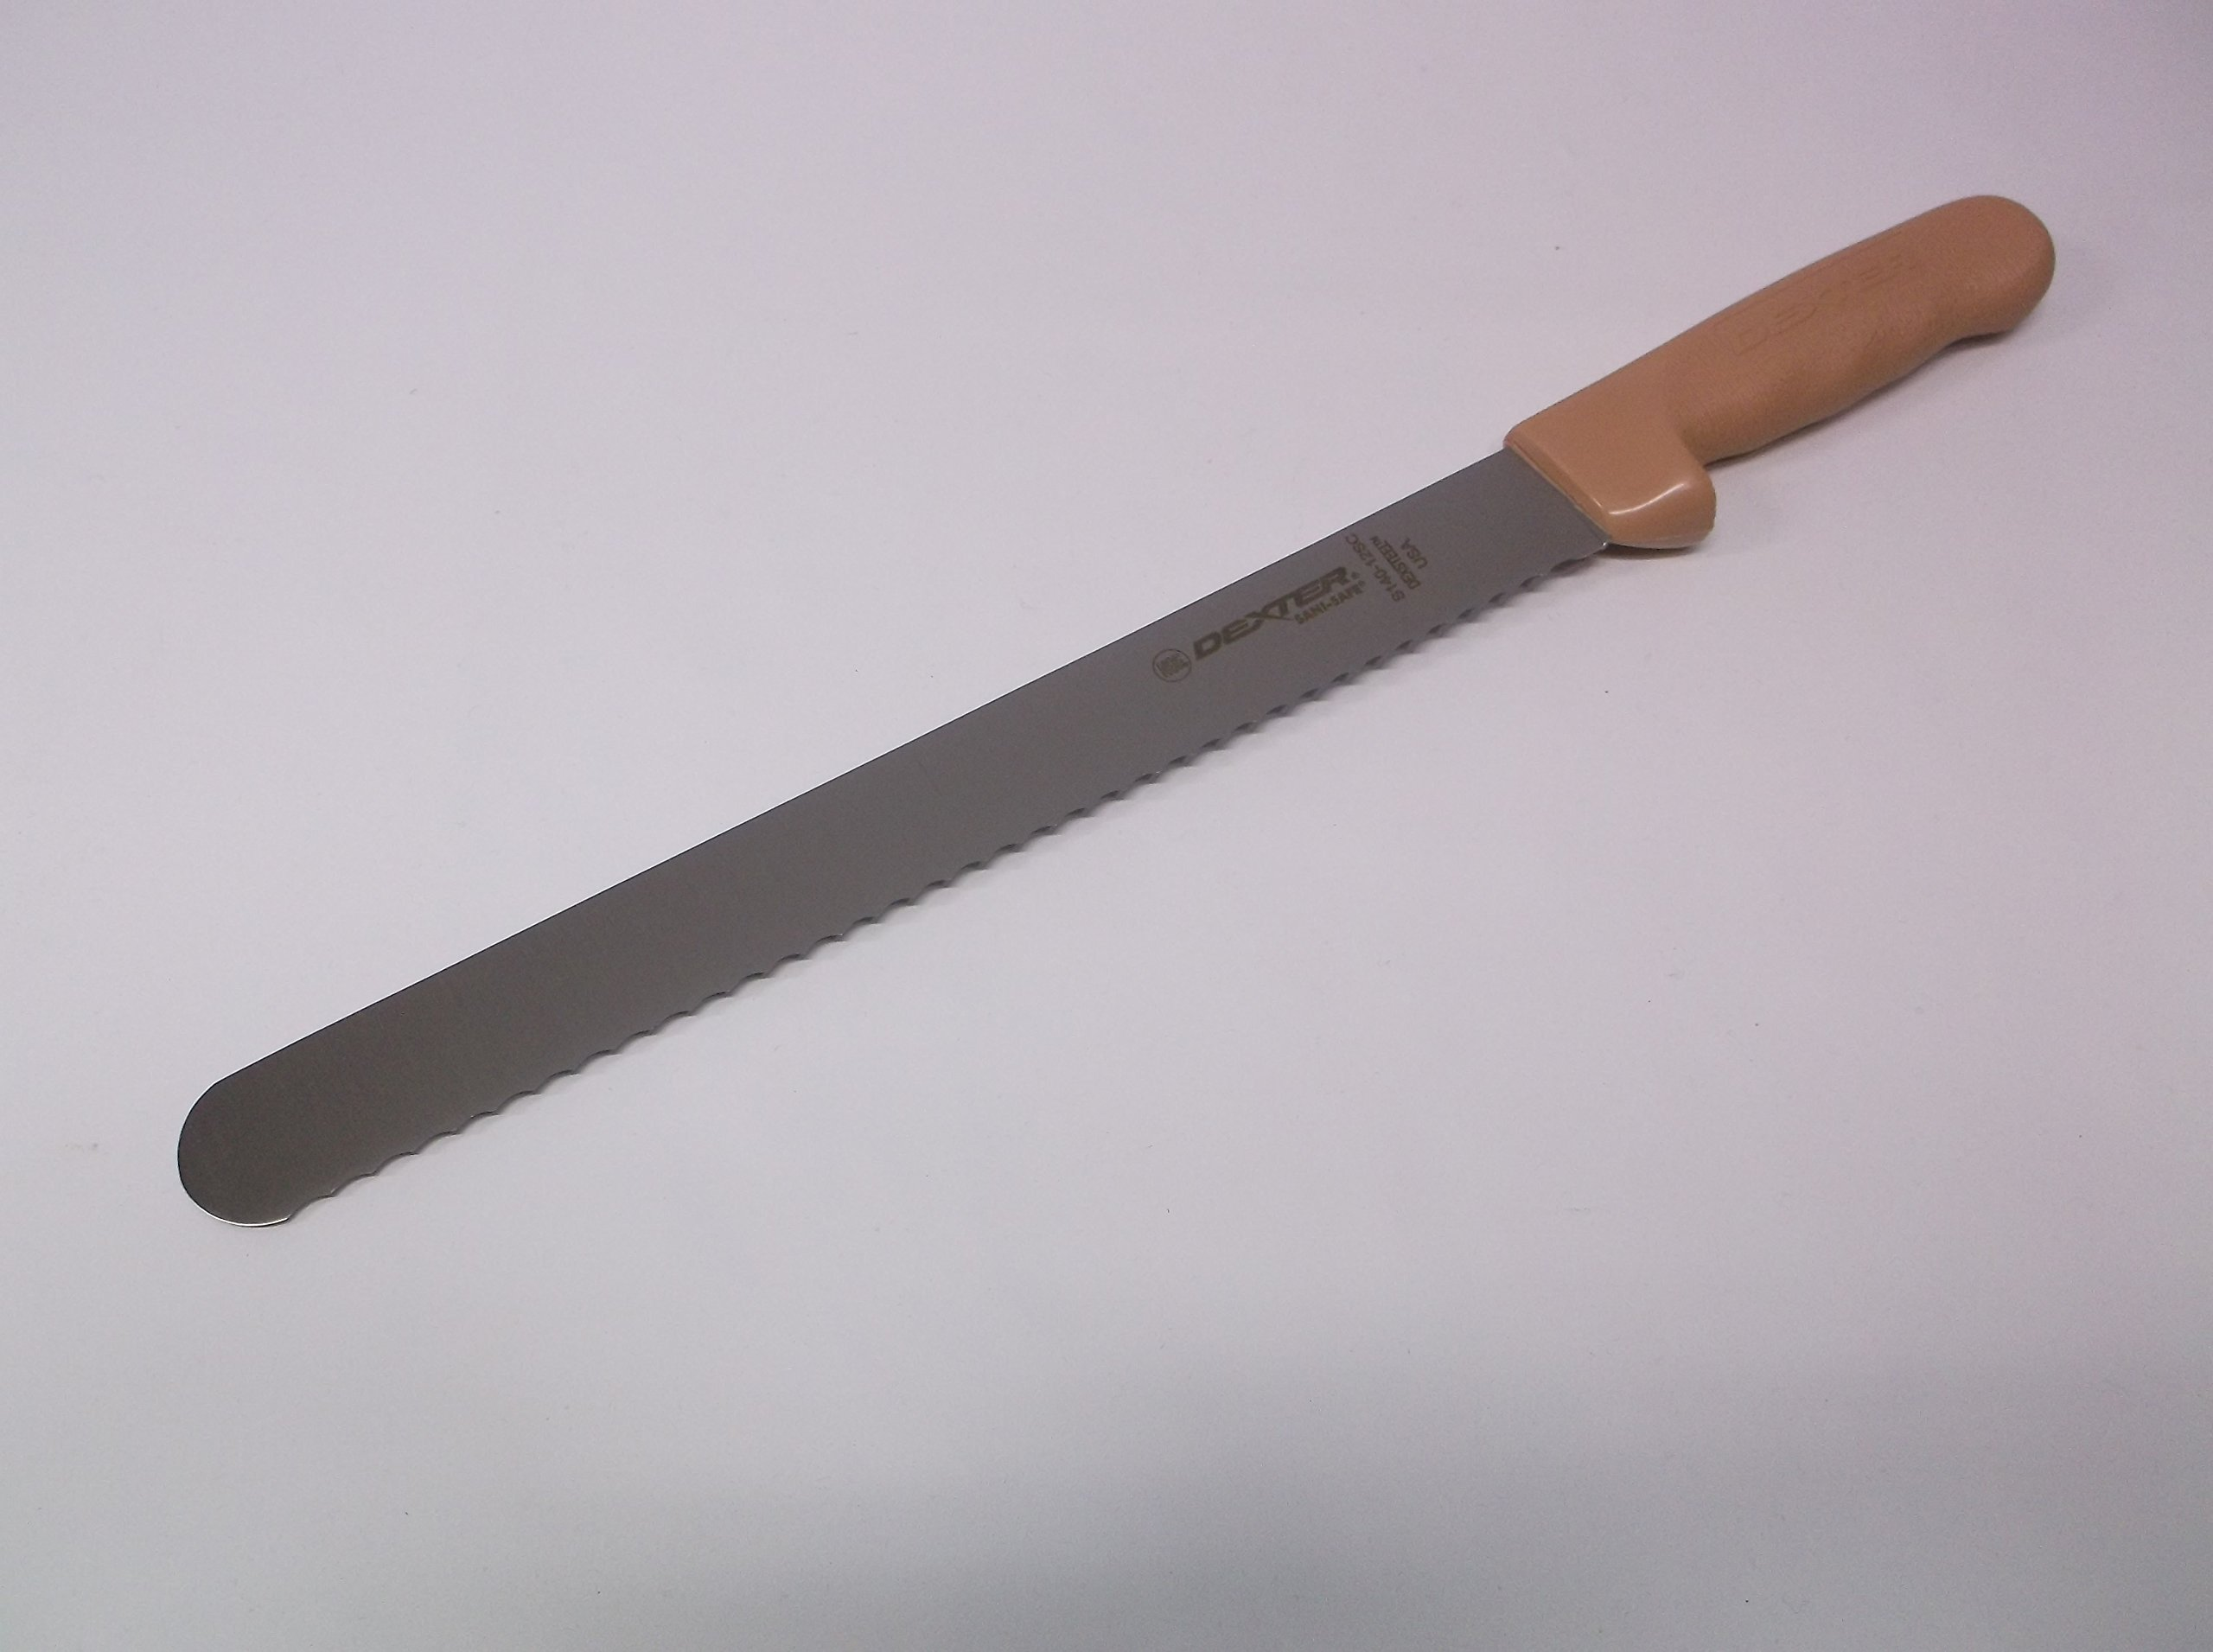 Dexter Russell S140-12SC Commercial Serrated Scalloped Bread Slicer Long 12 inch Stainless Steel Blade Brand New & Razor Sharp